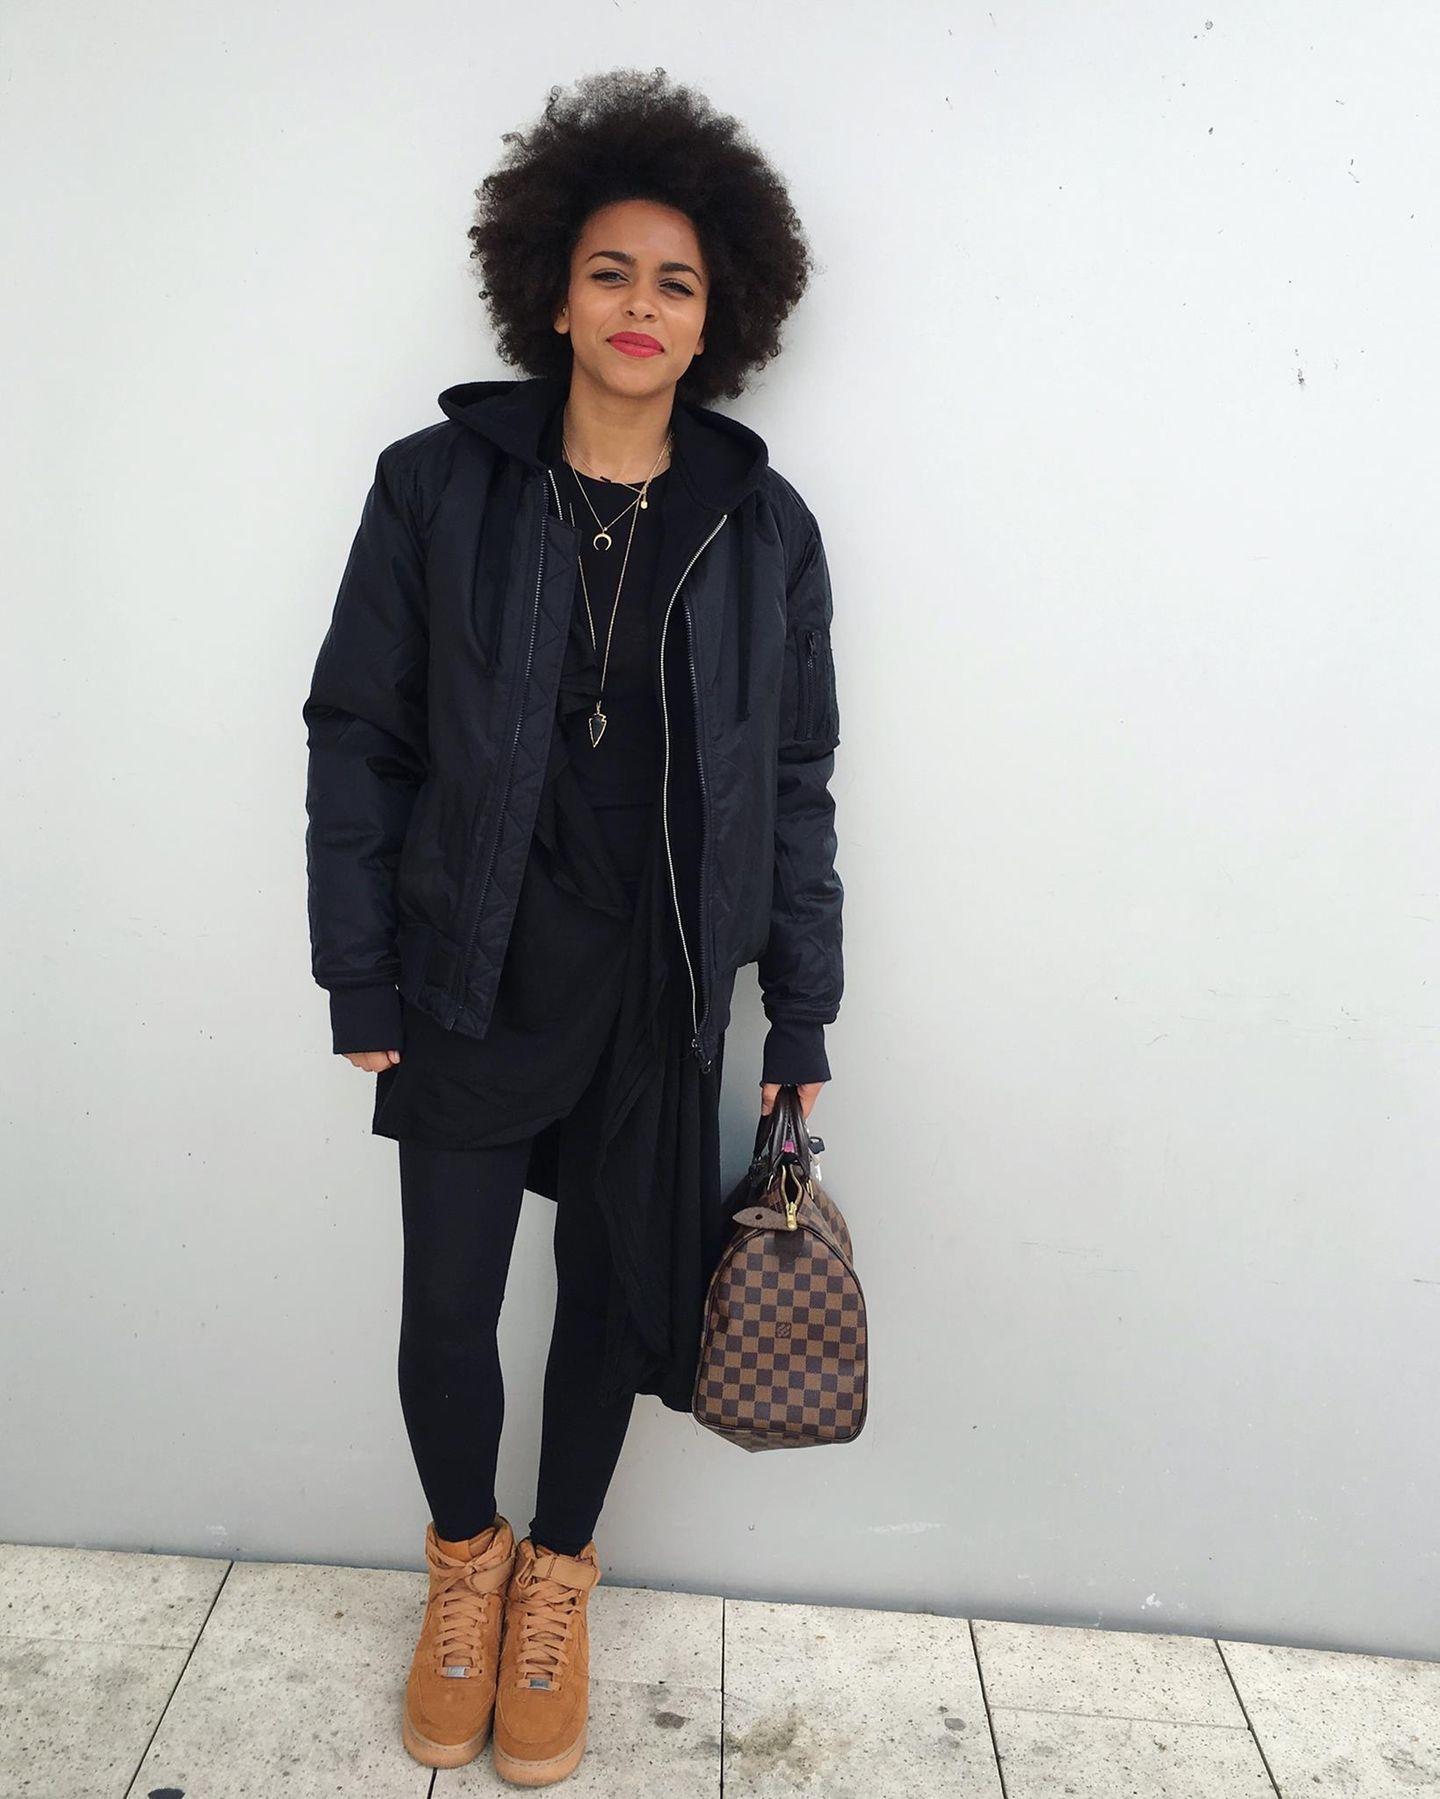 Aminata Belli, Mode-Assistentin bei der Grazia